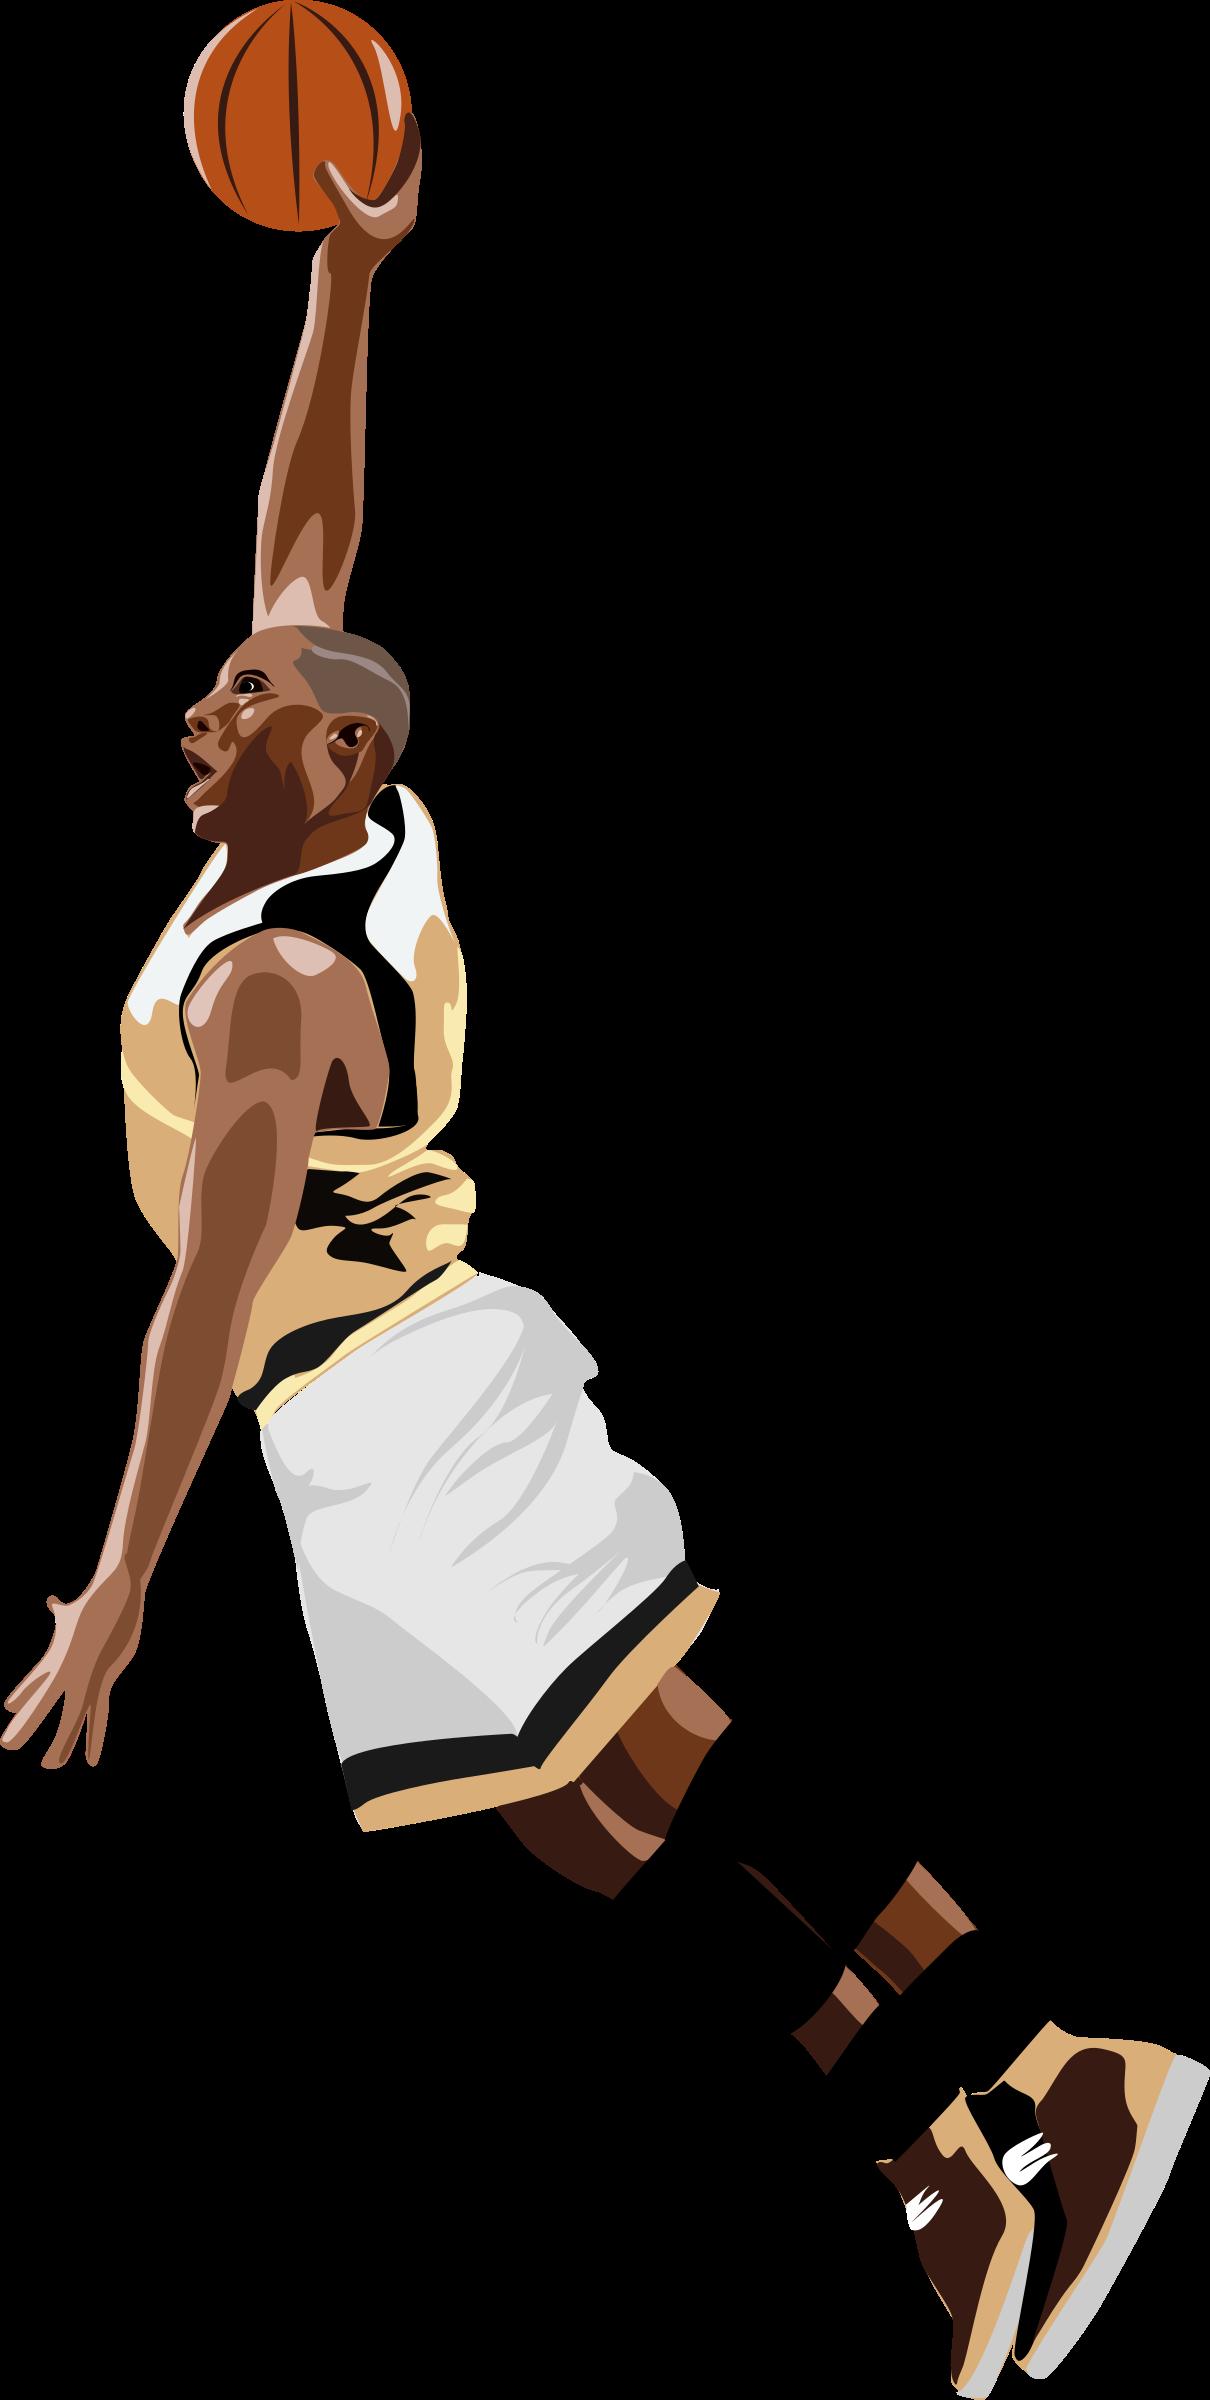 Slamdunk big image png. Clipart person basketball